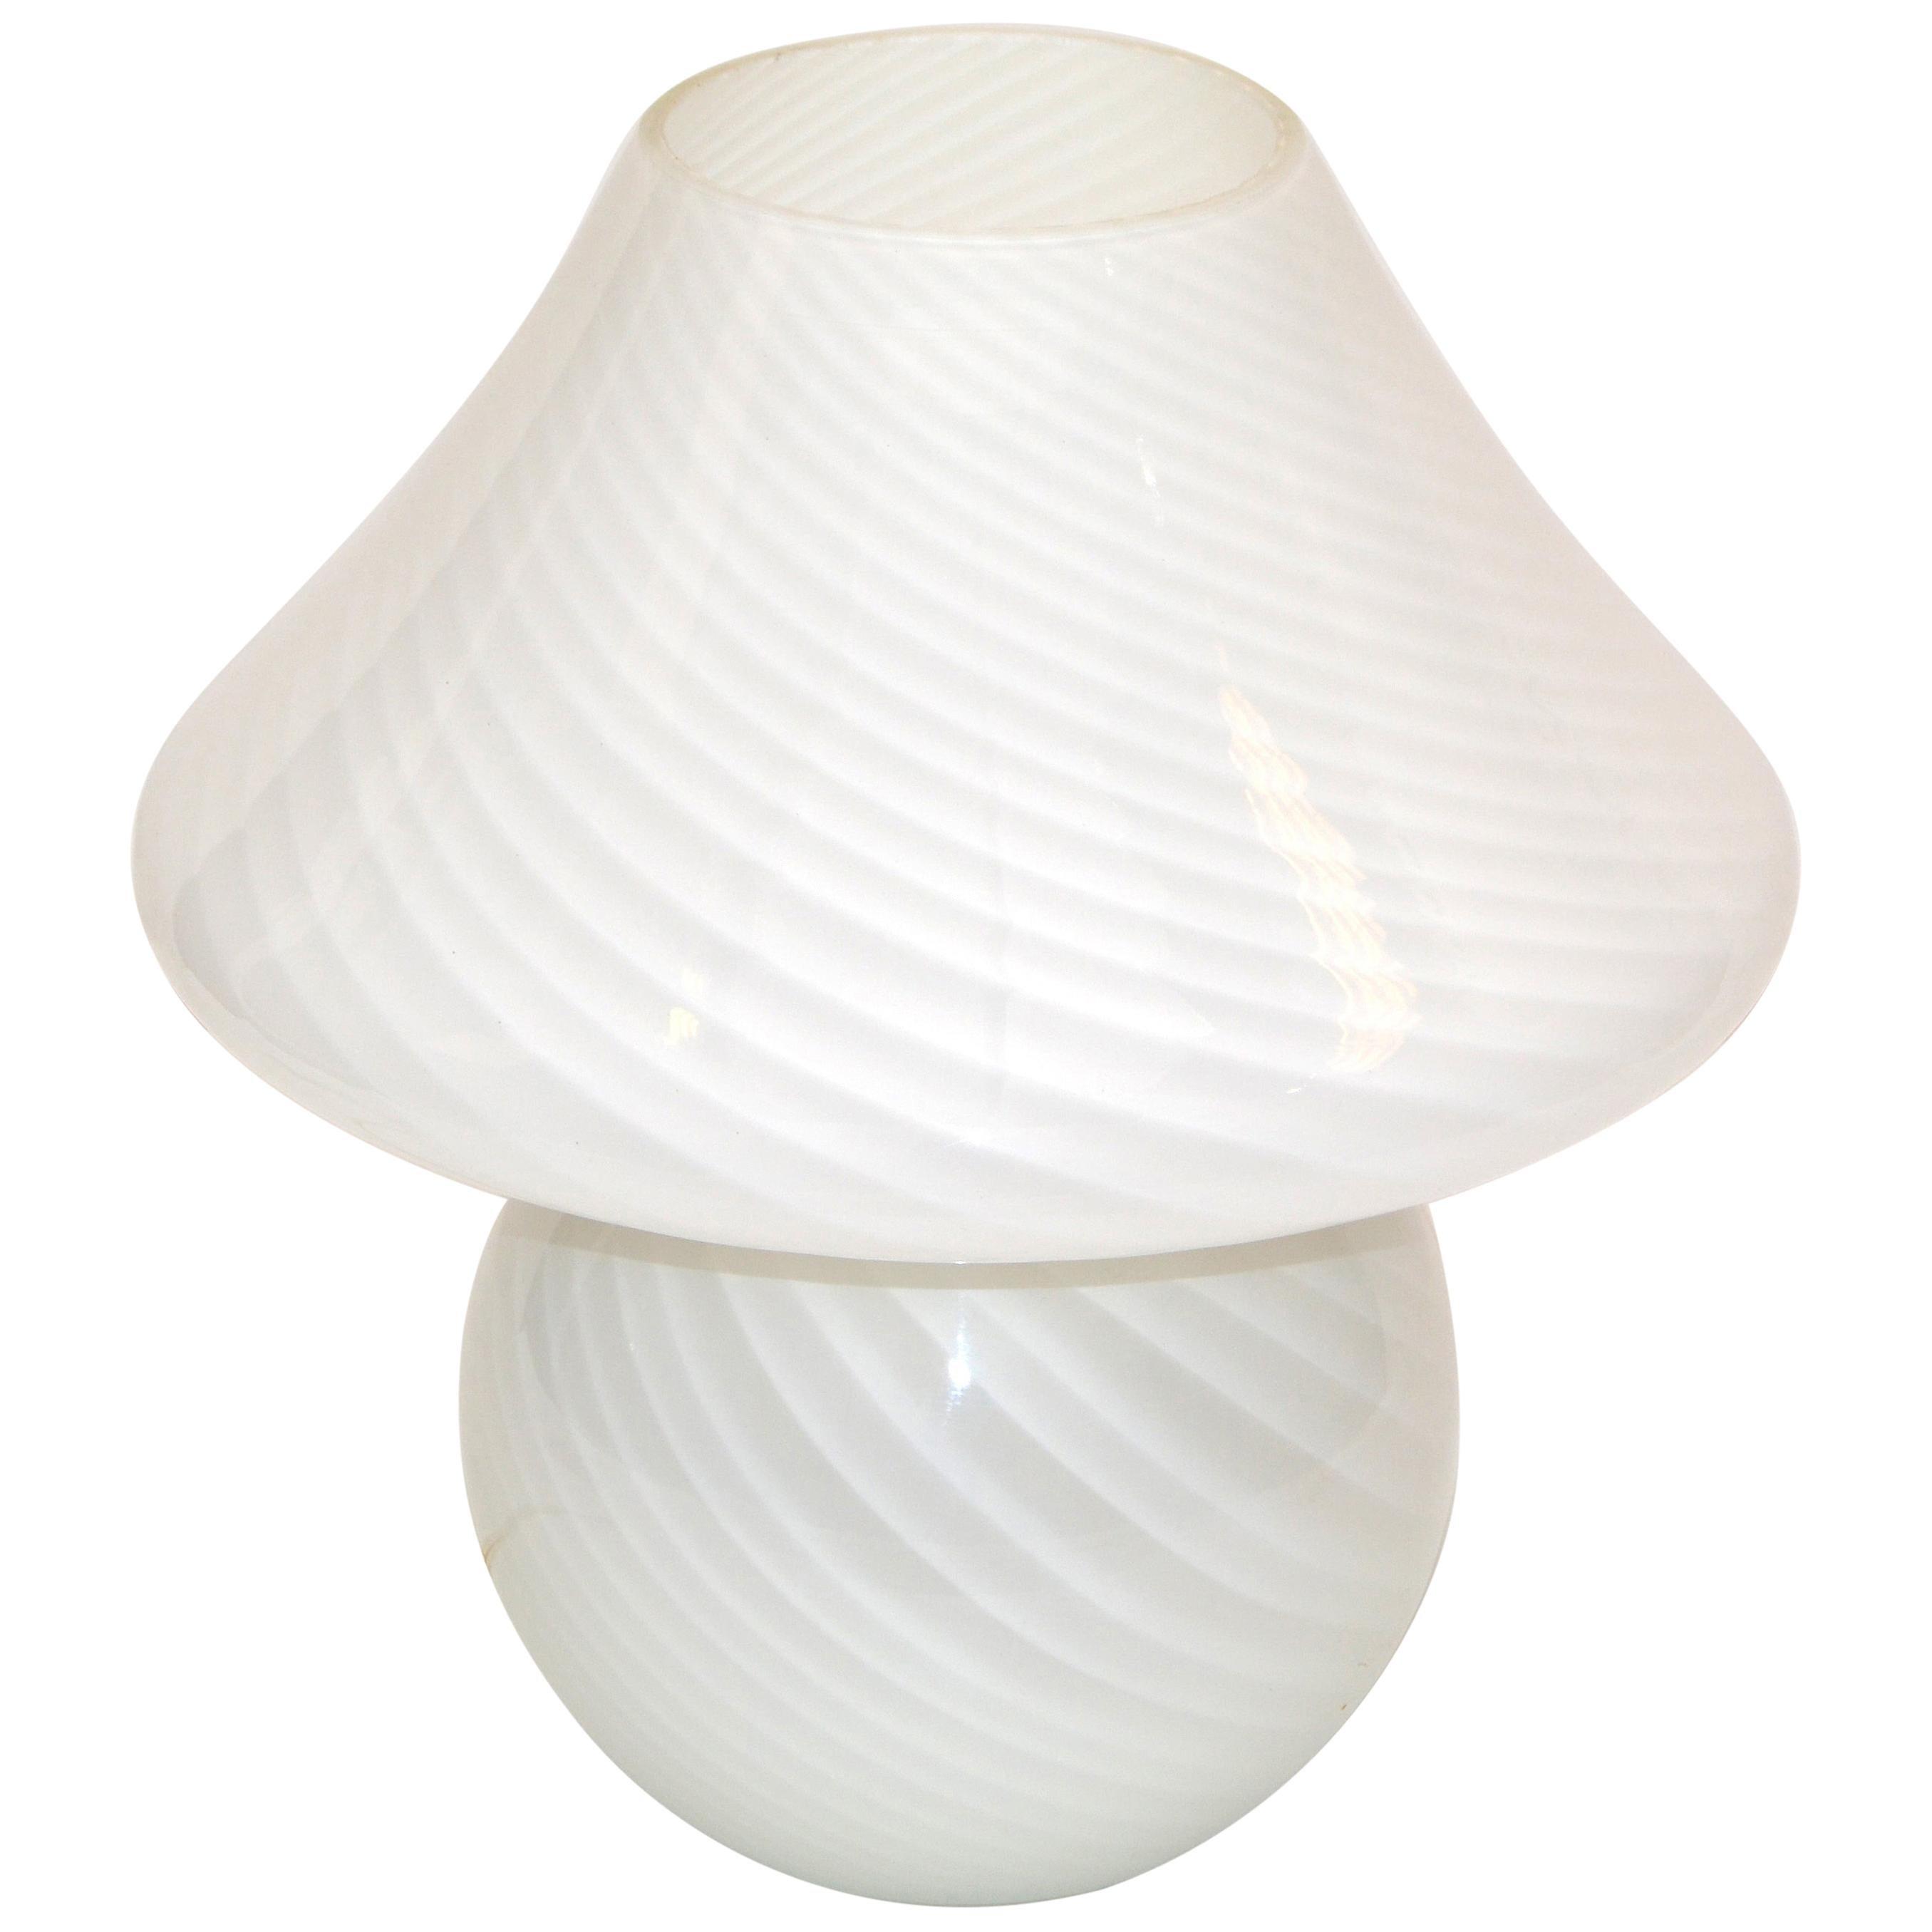 Venini Style Mid-Century Modern Blown Murano Glass Mushroom Table Lamp, Italy